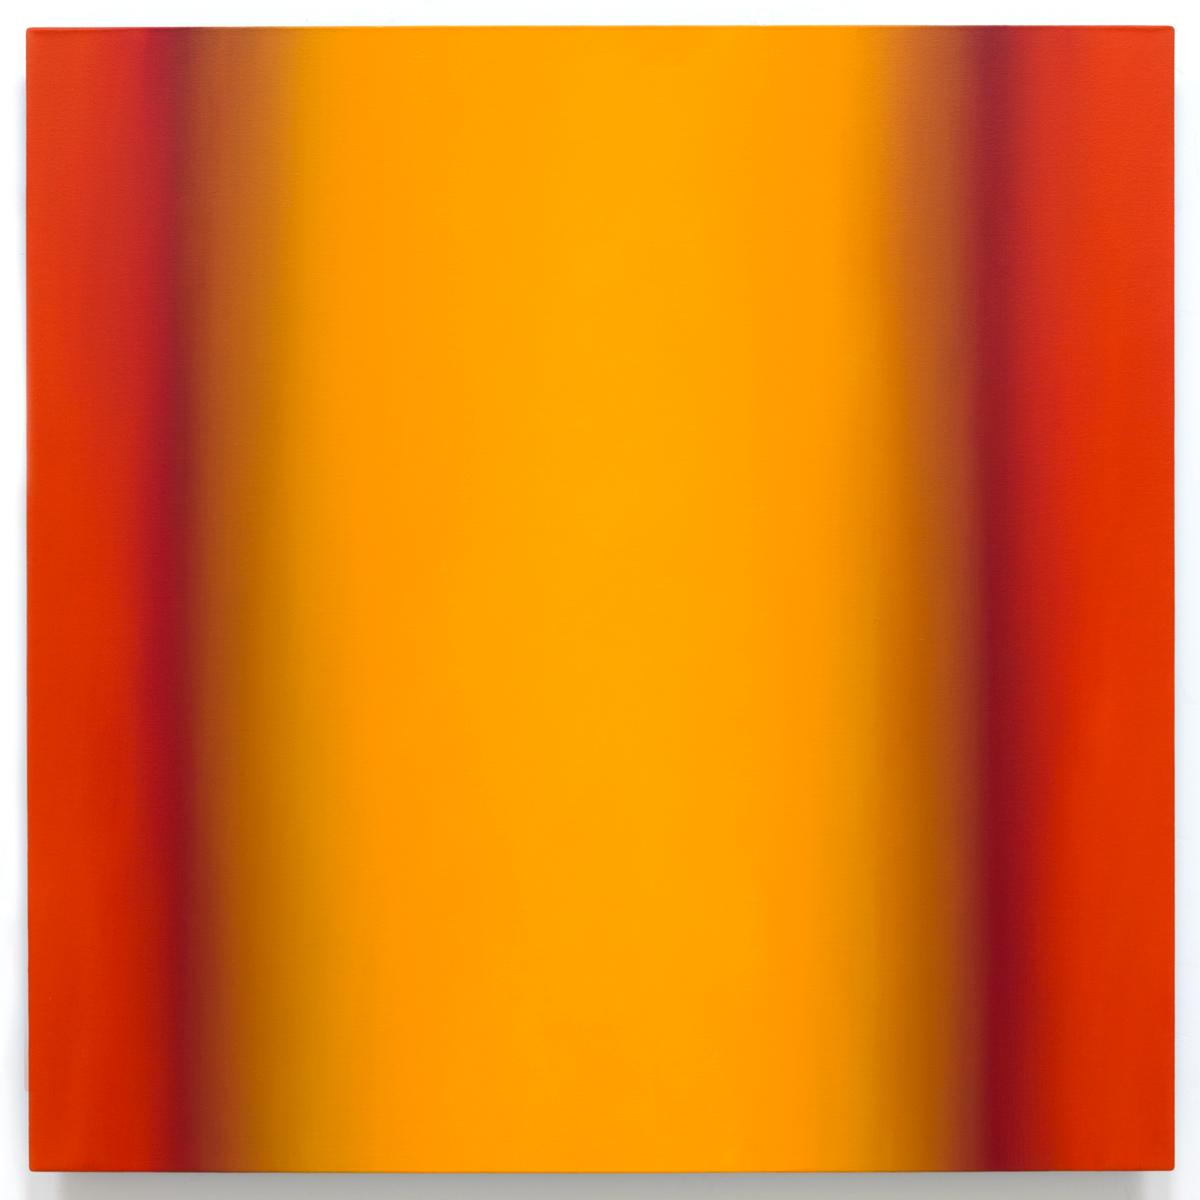 Blue Orange 2-S4848 (Yellow Orange), Interplay Series, 2013, oil on canvas on custom beveled stretcher, 48 x 48 in. (122 x 122 cm.)